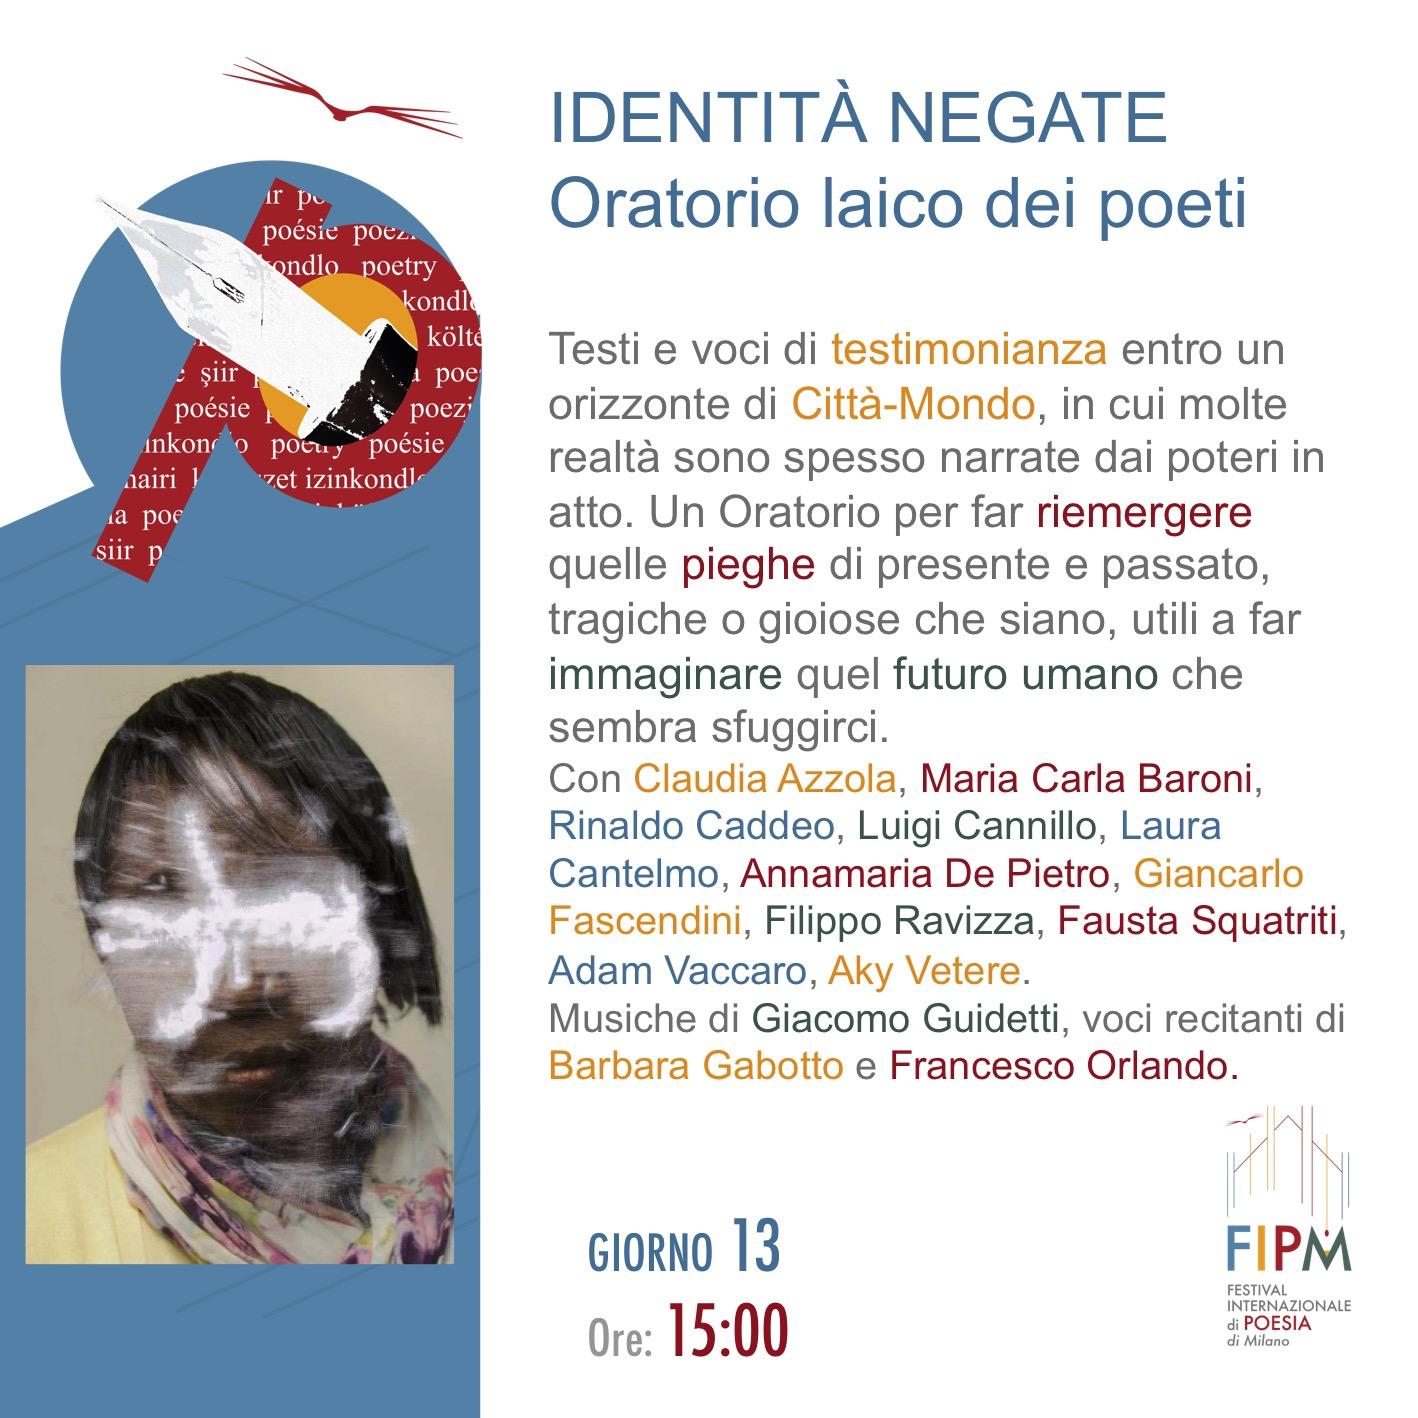 Identita Negate